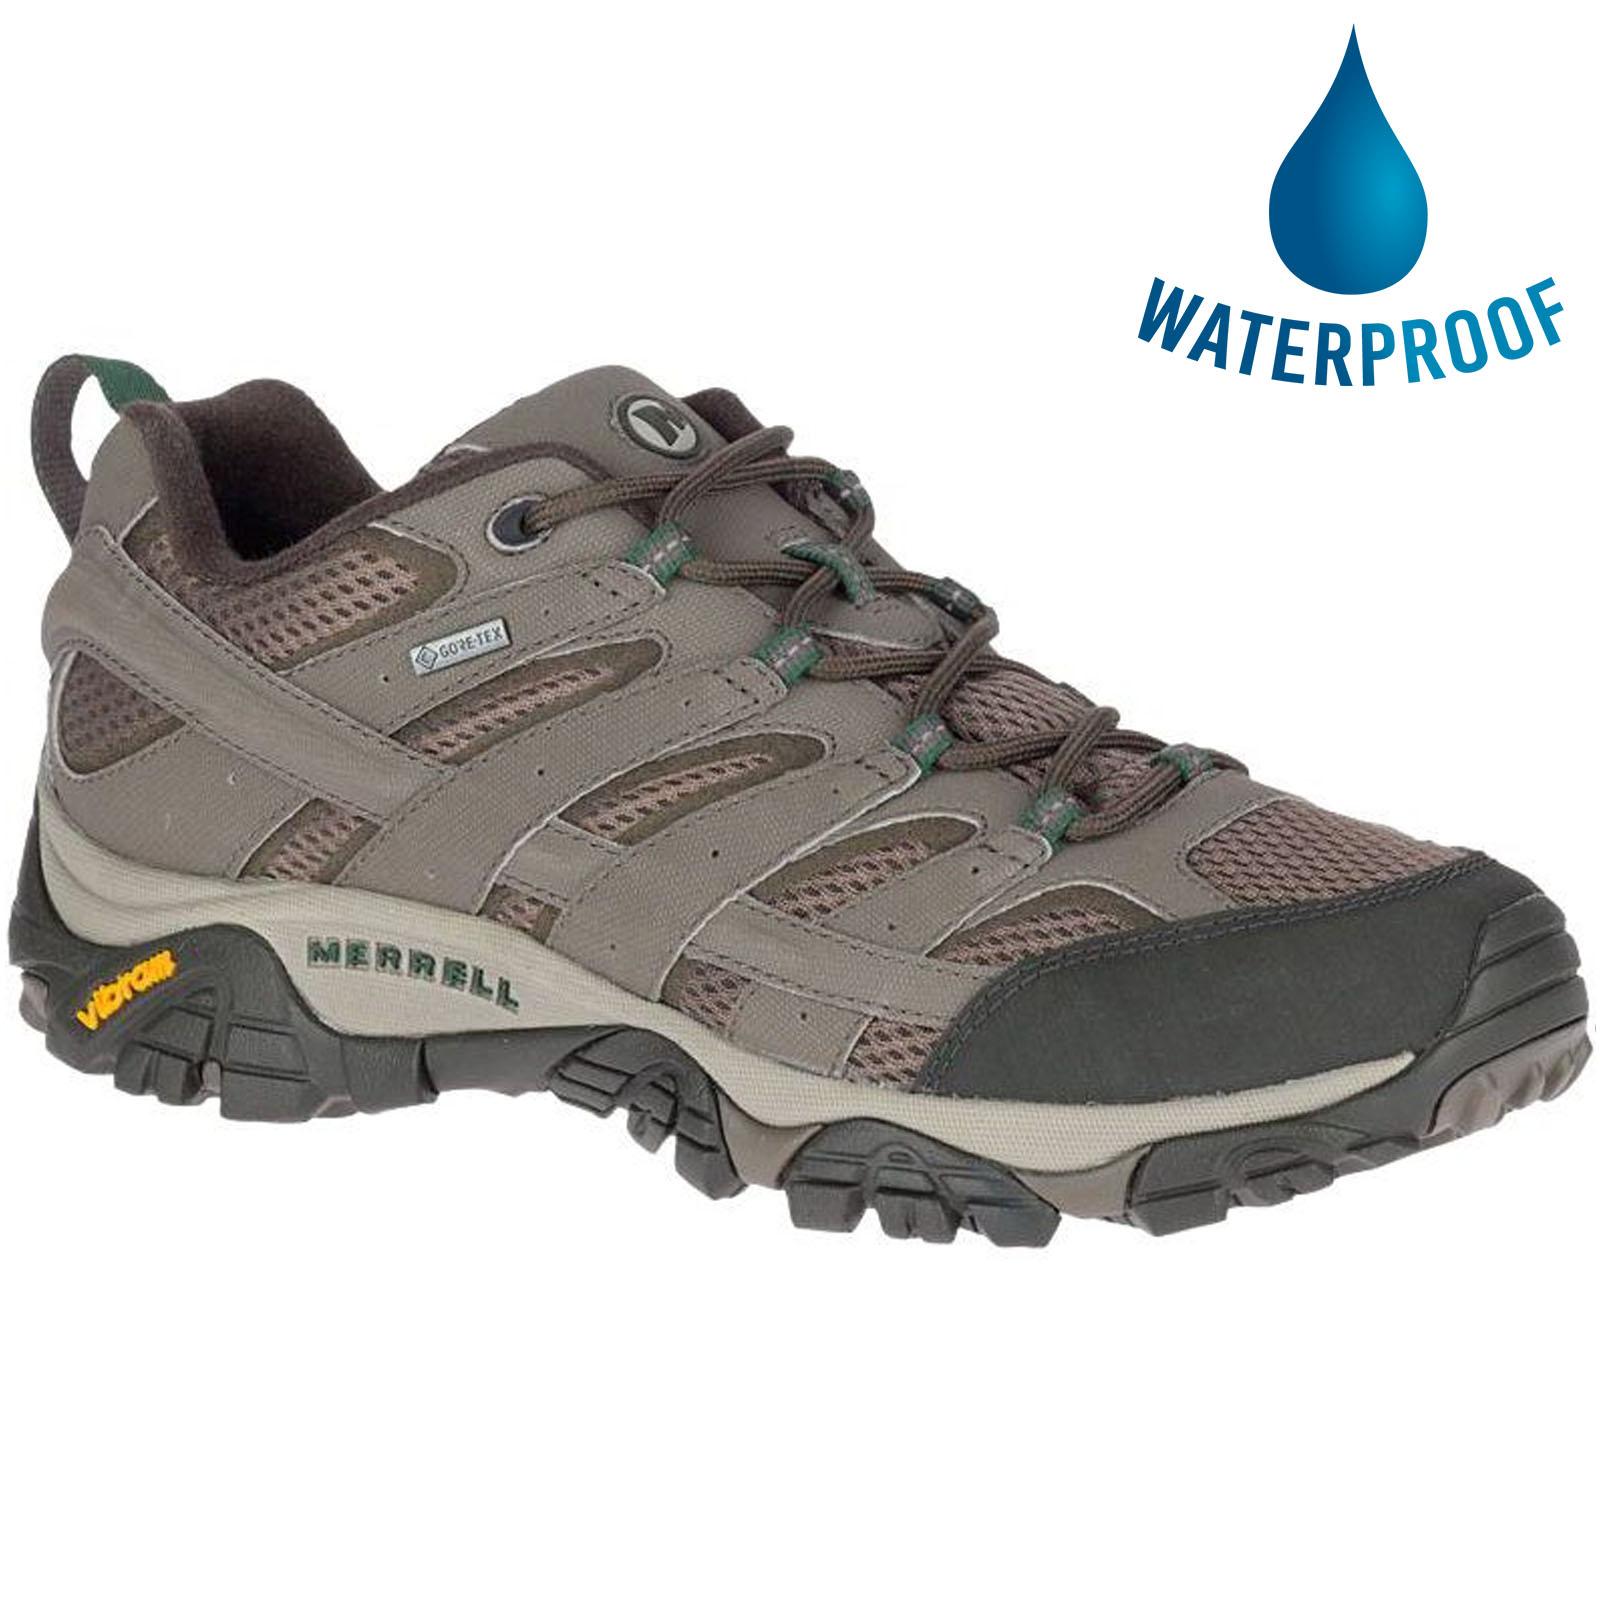 Merrell Mens Moab 2 GTX Walking Shoes - Boulder